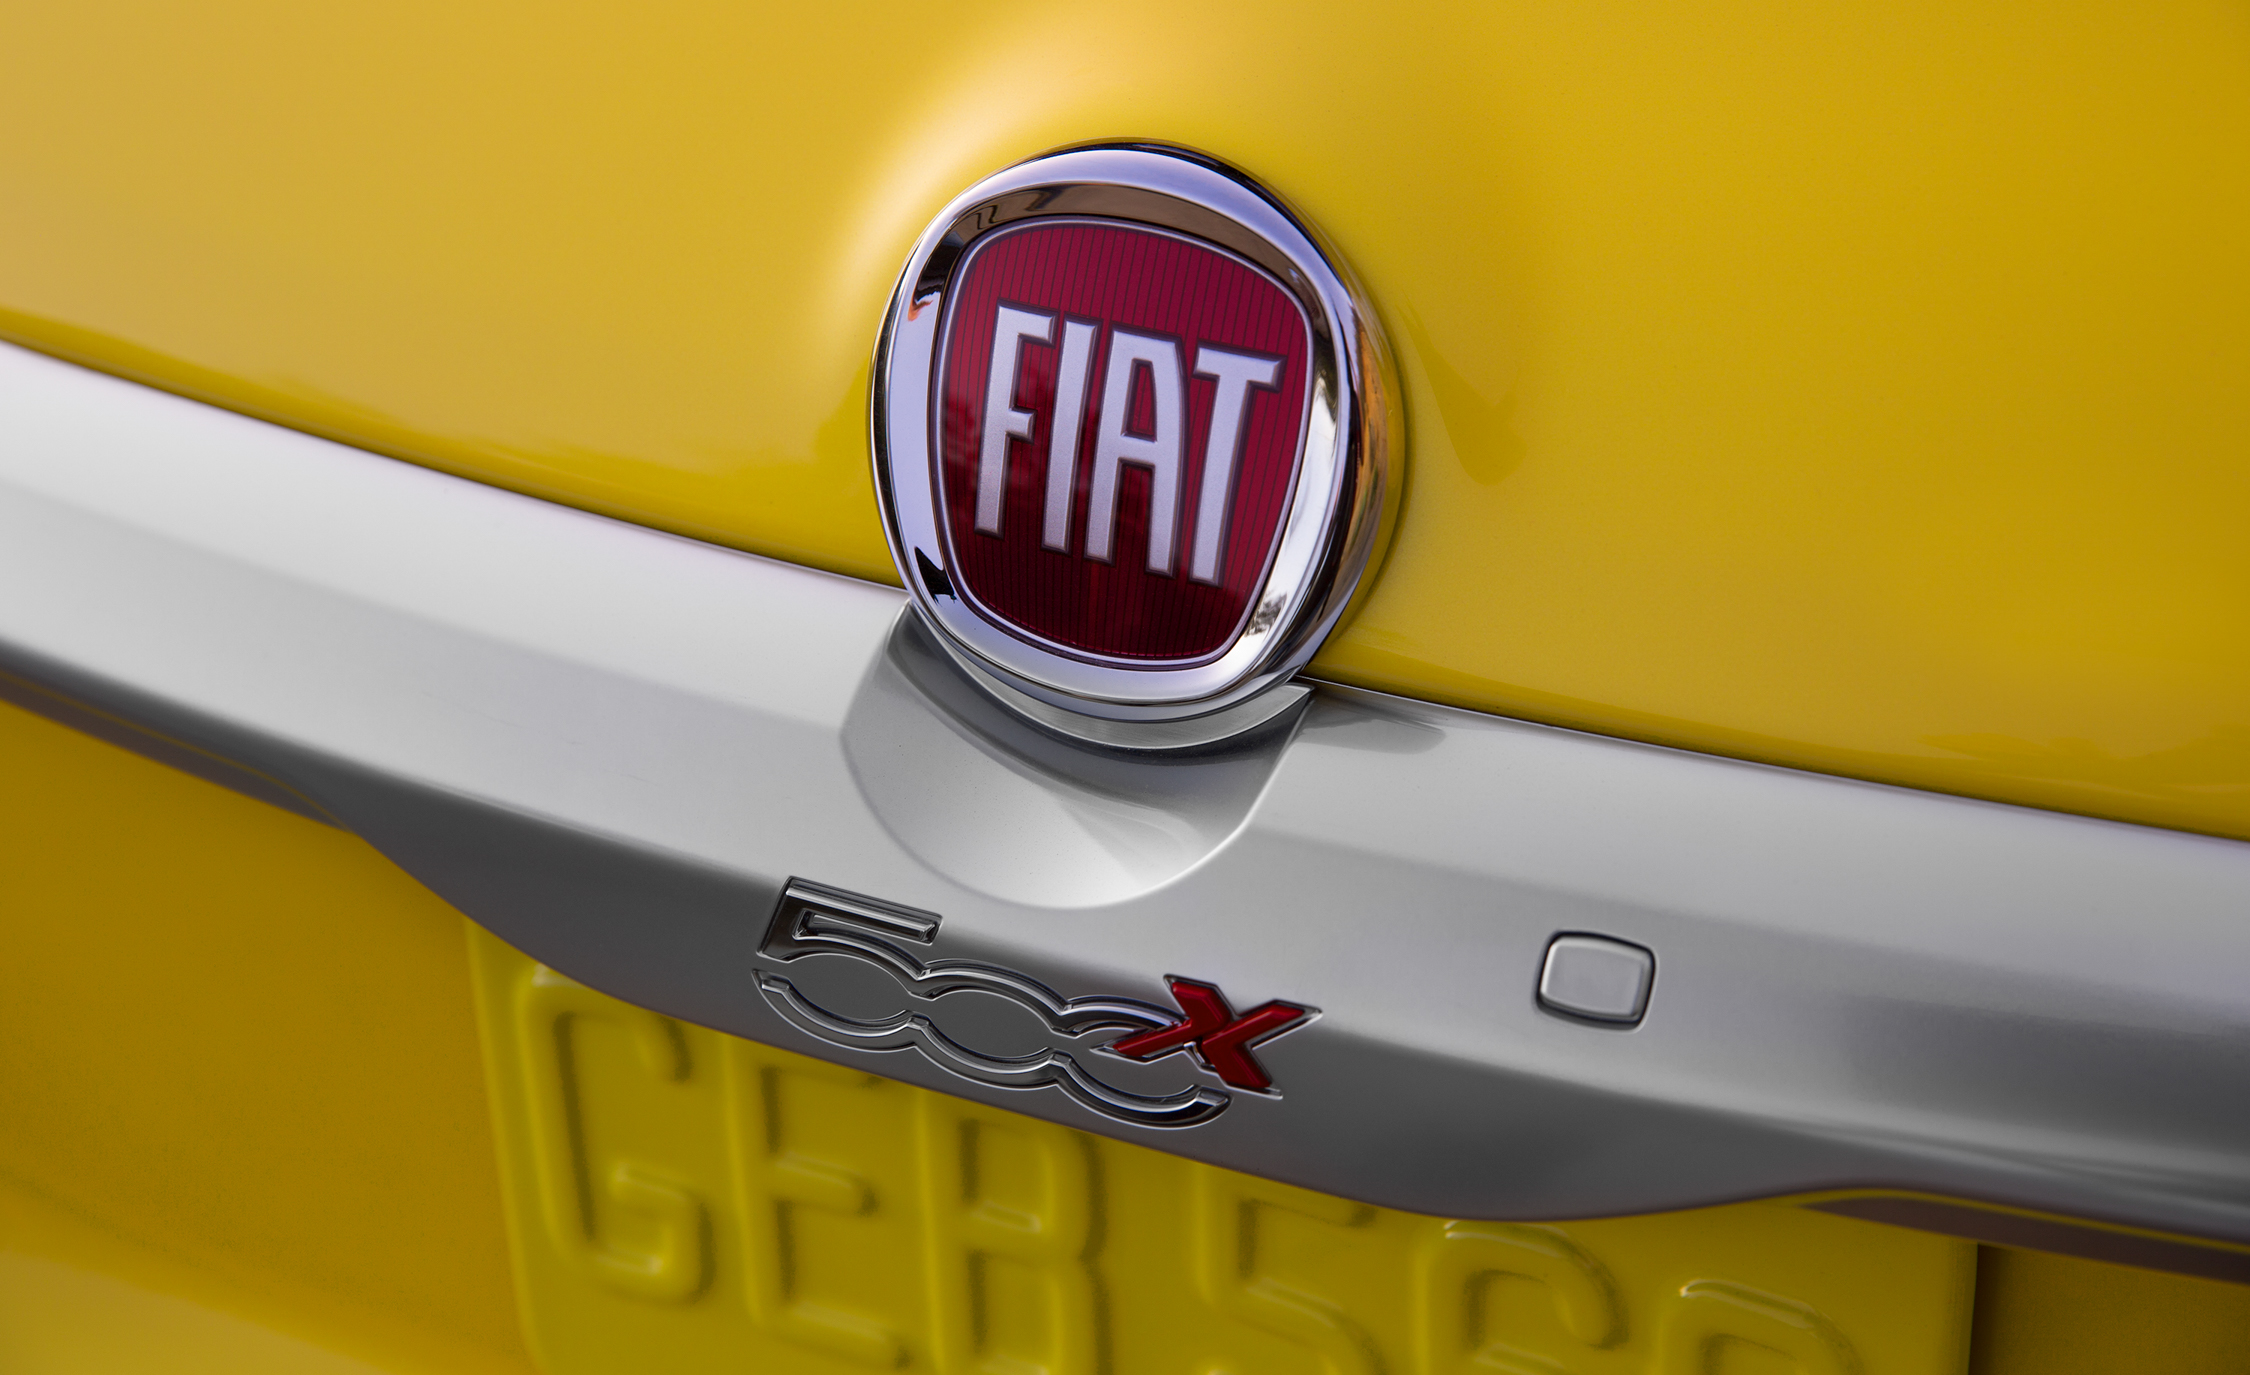 2016 Fiat 500X Trekking Plus Yellow Exterior Rear Emblem